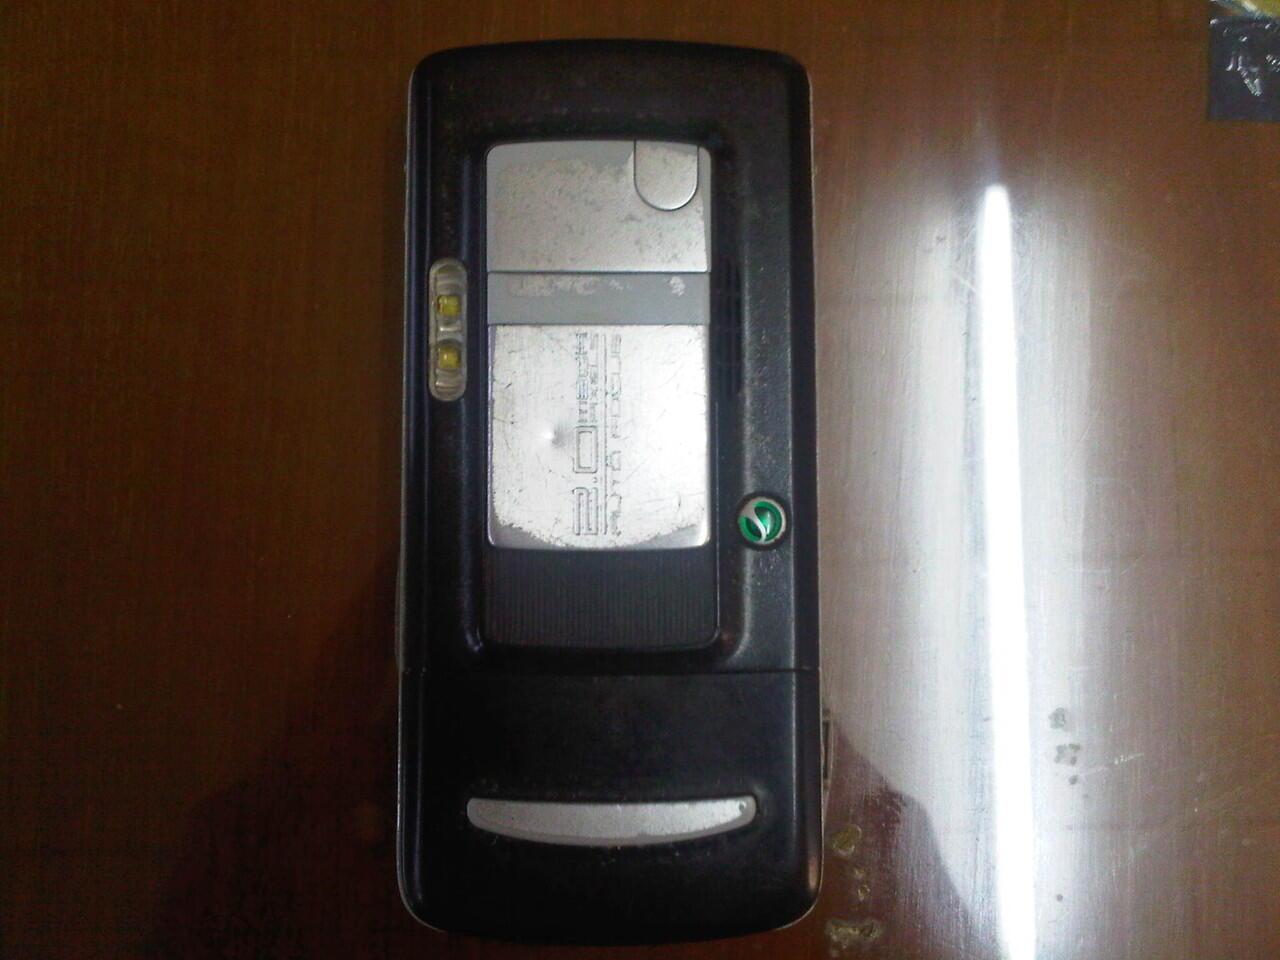 BB Huron 8830 Error 507 + SE K750i Jogja Magelang